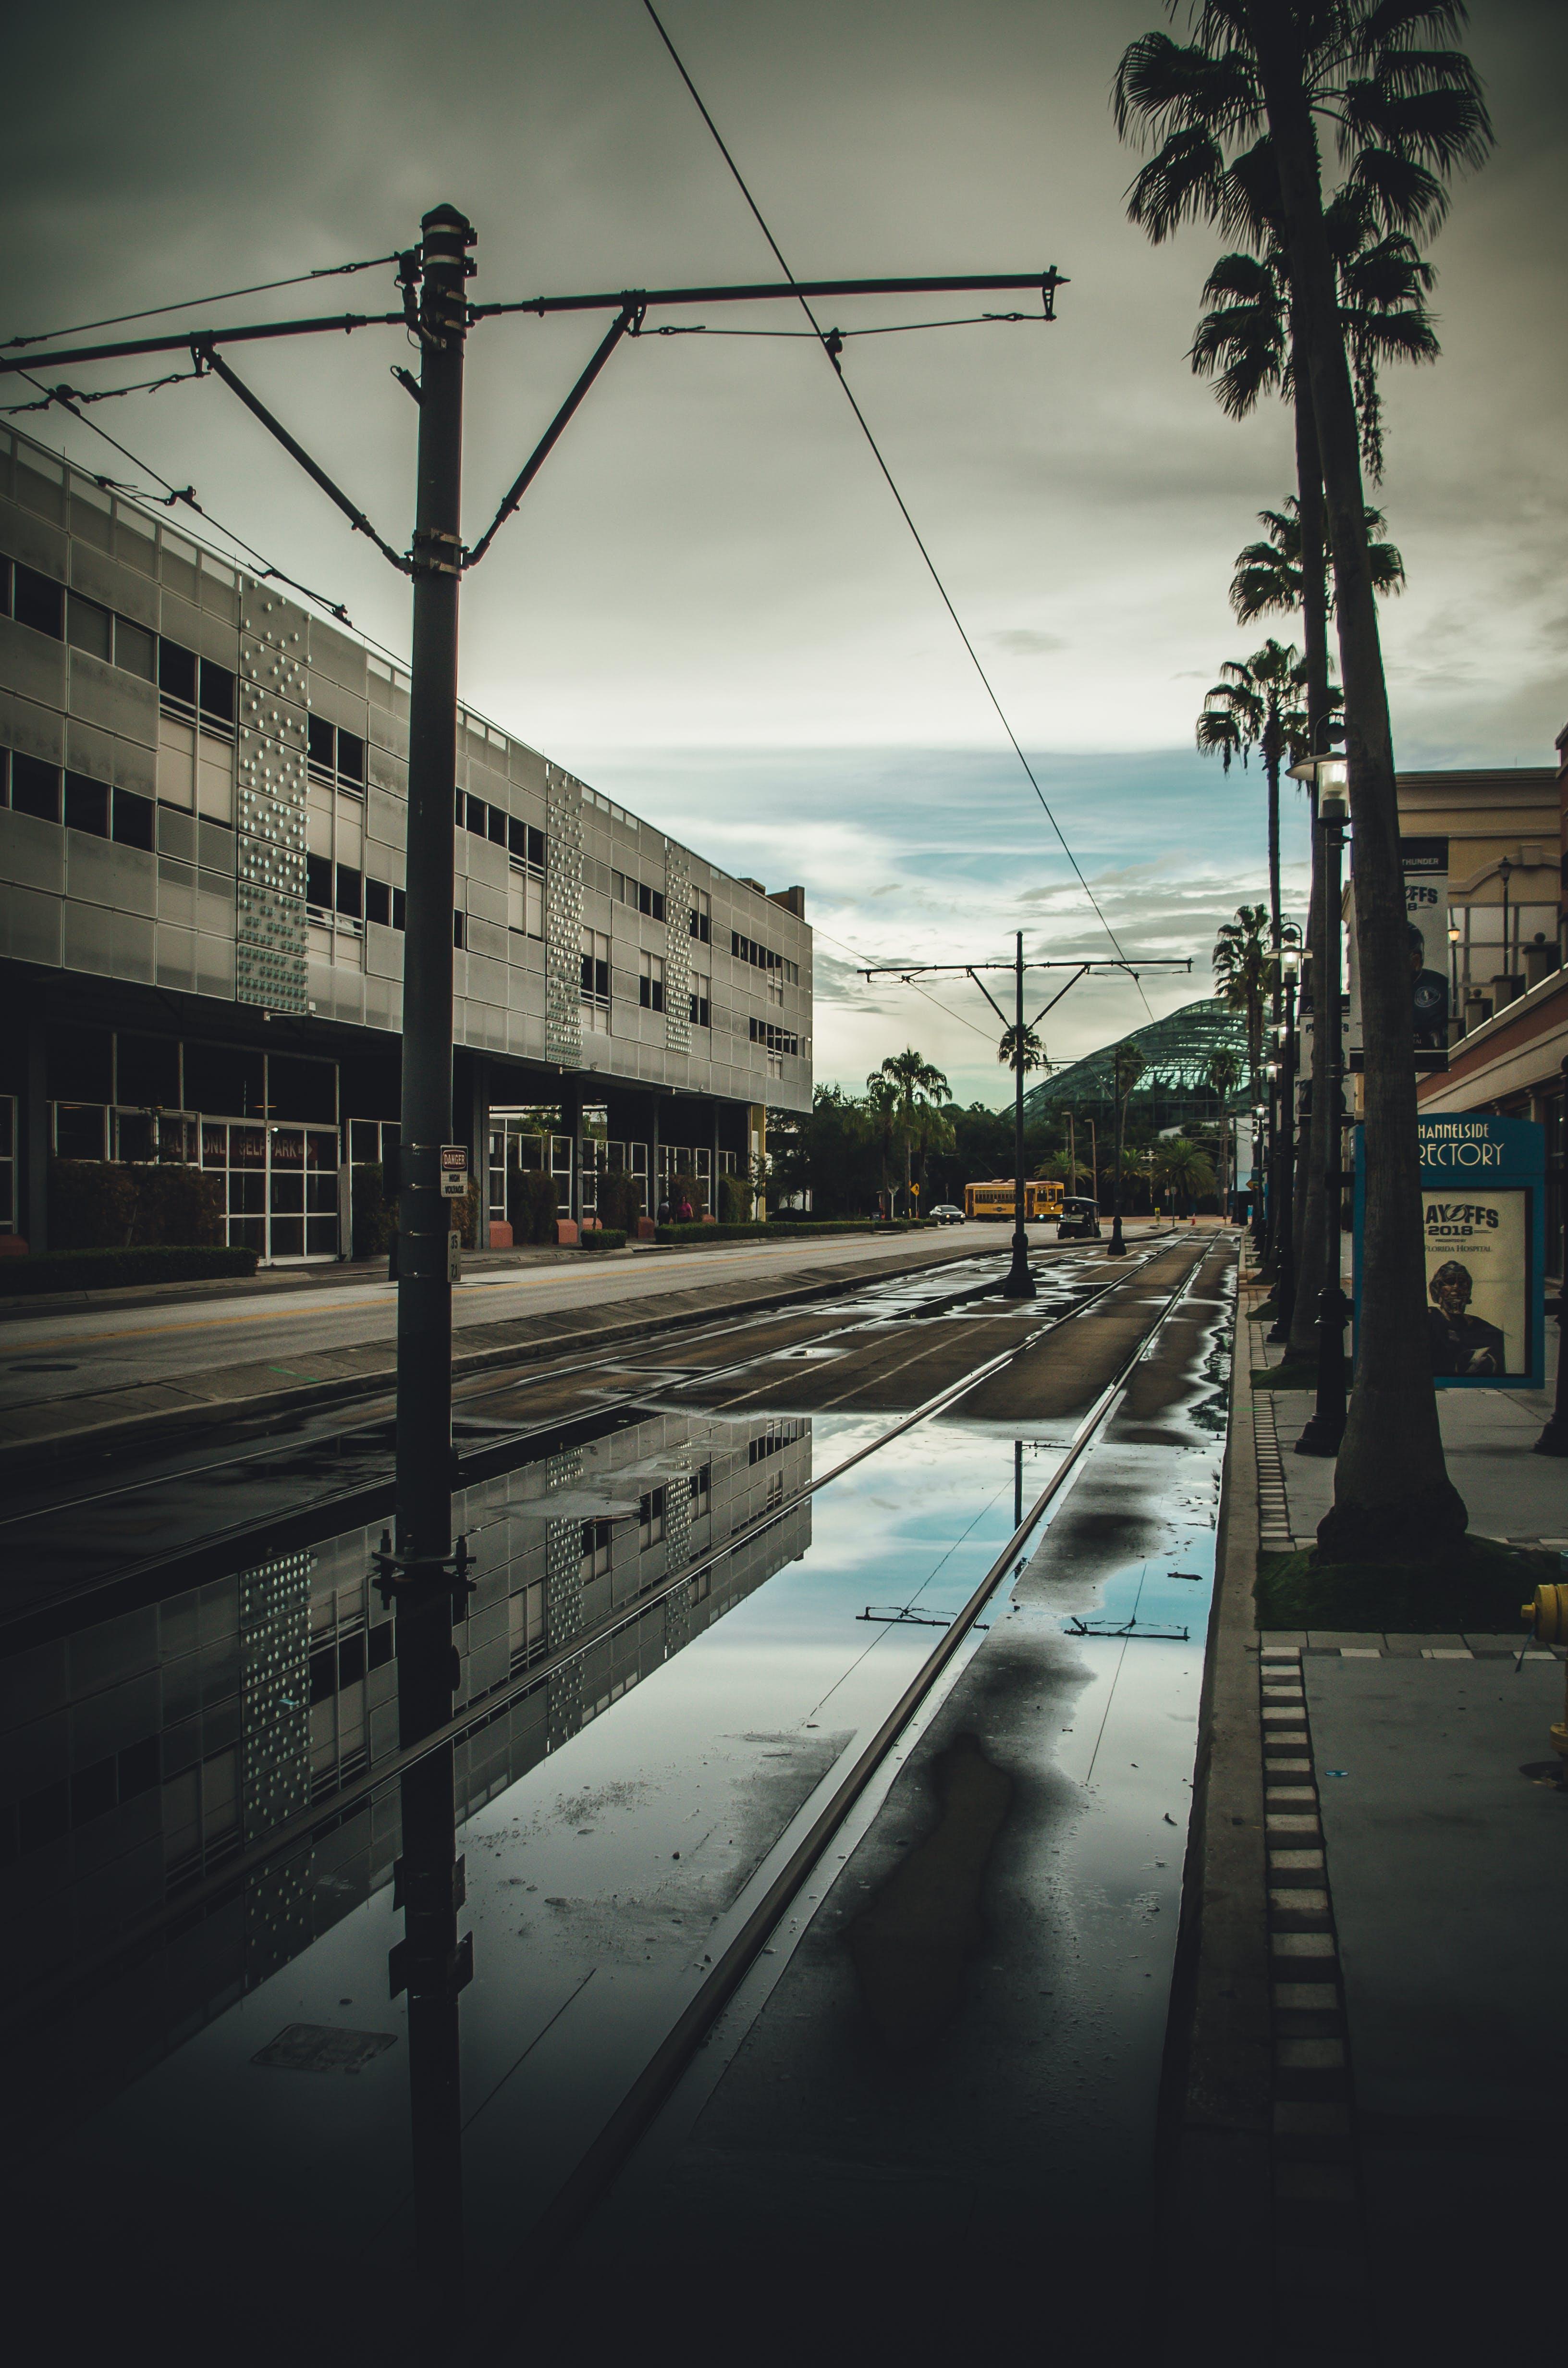 Free stock photo of street, photography, reflection, urban